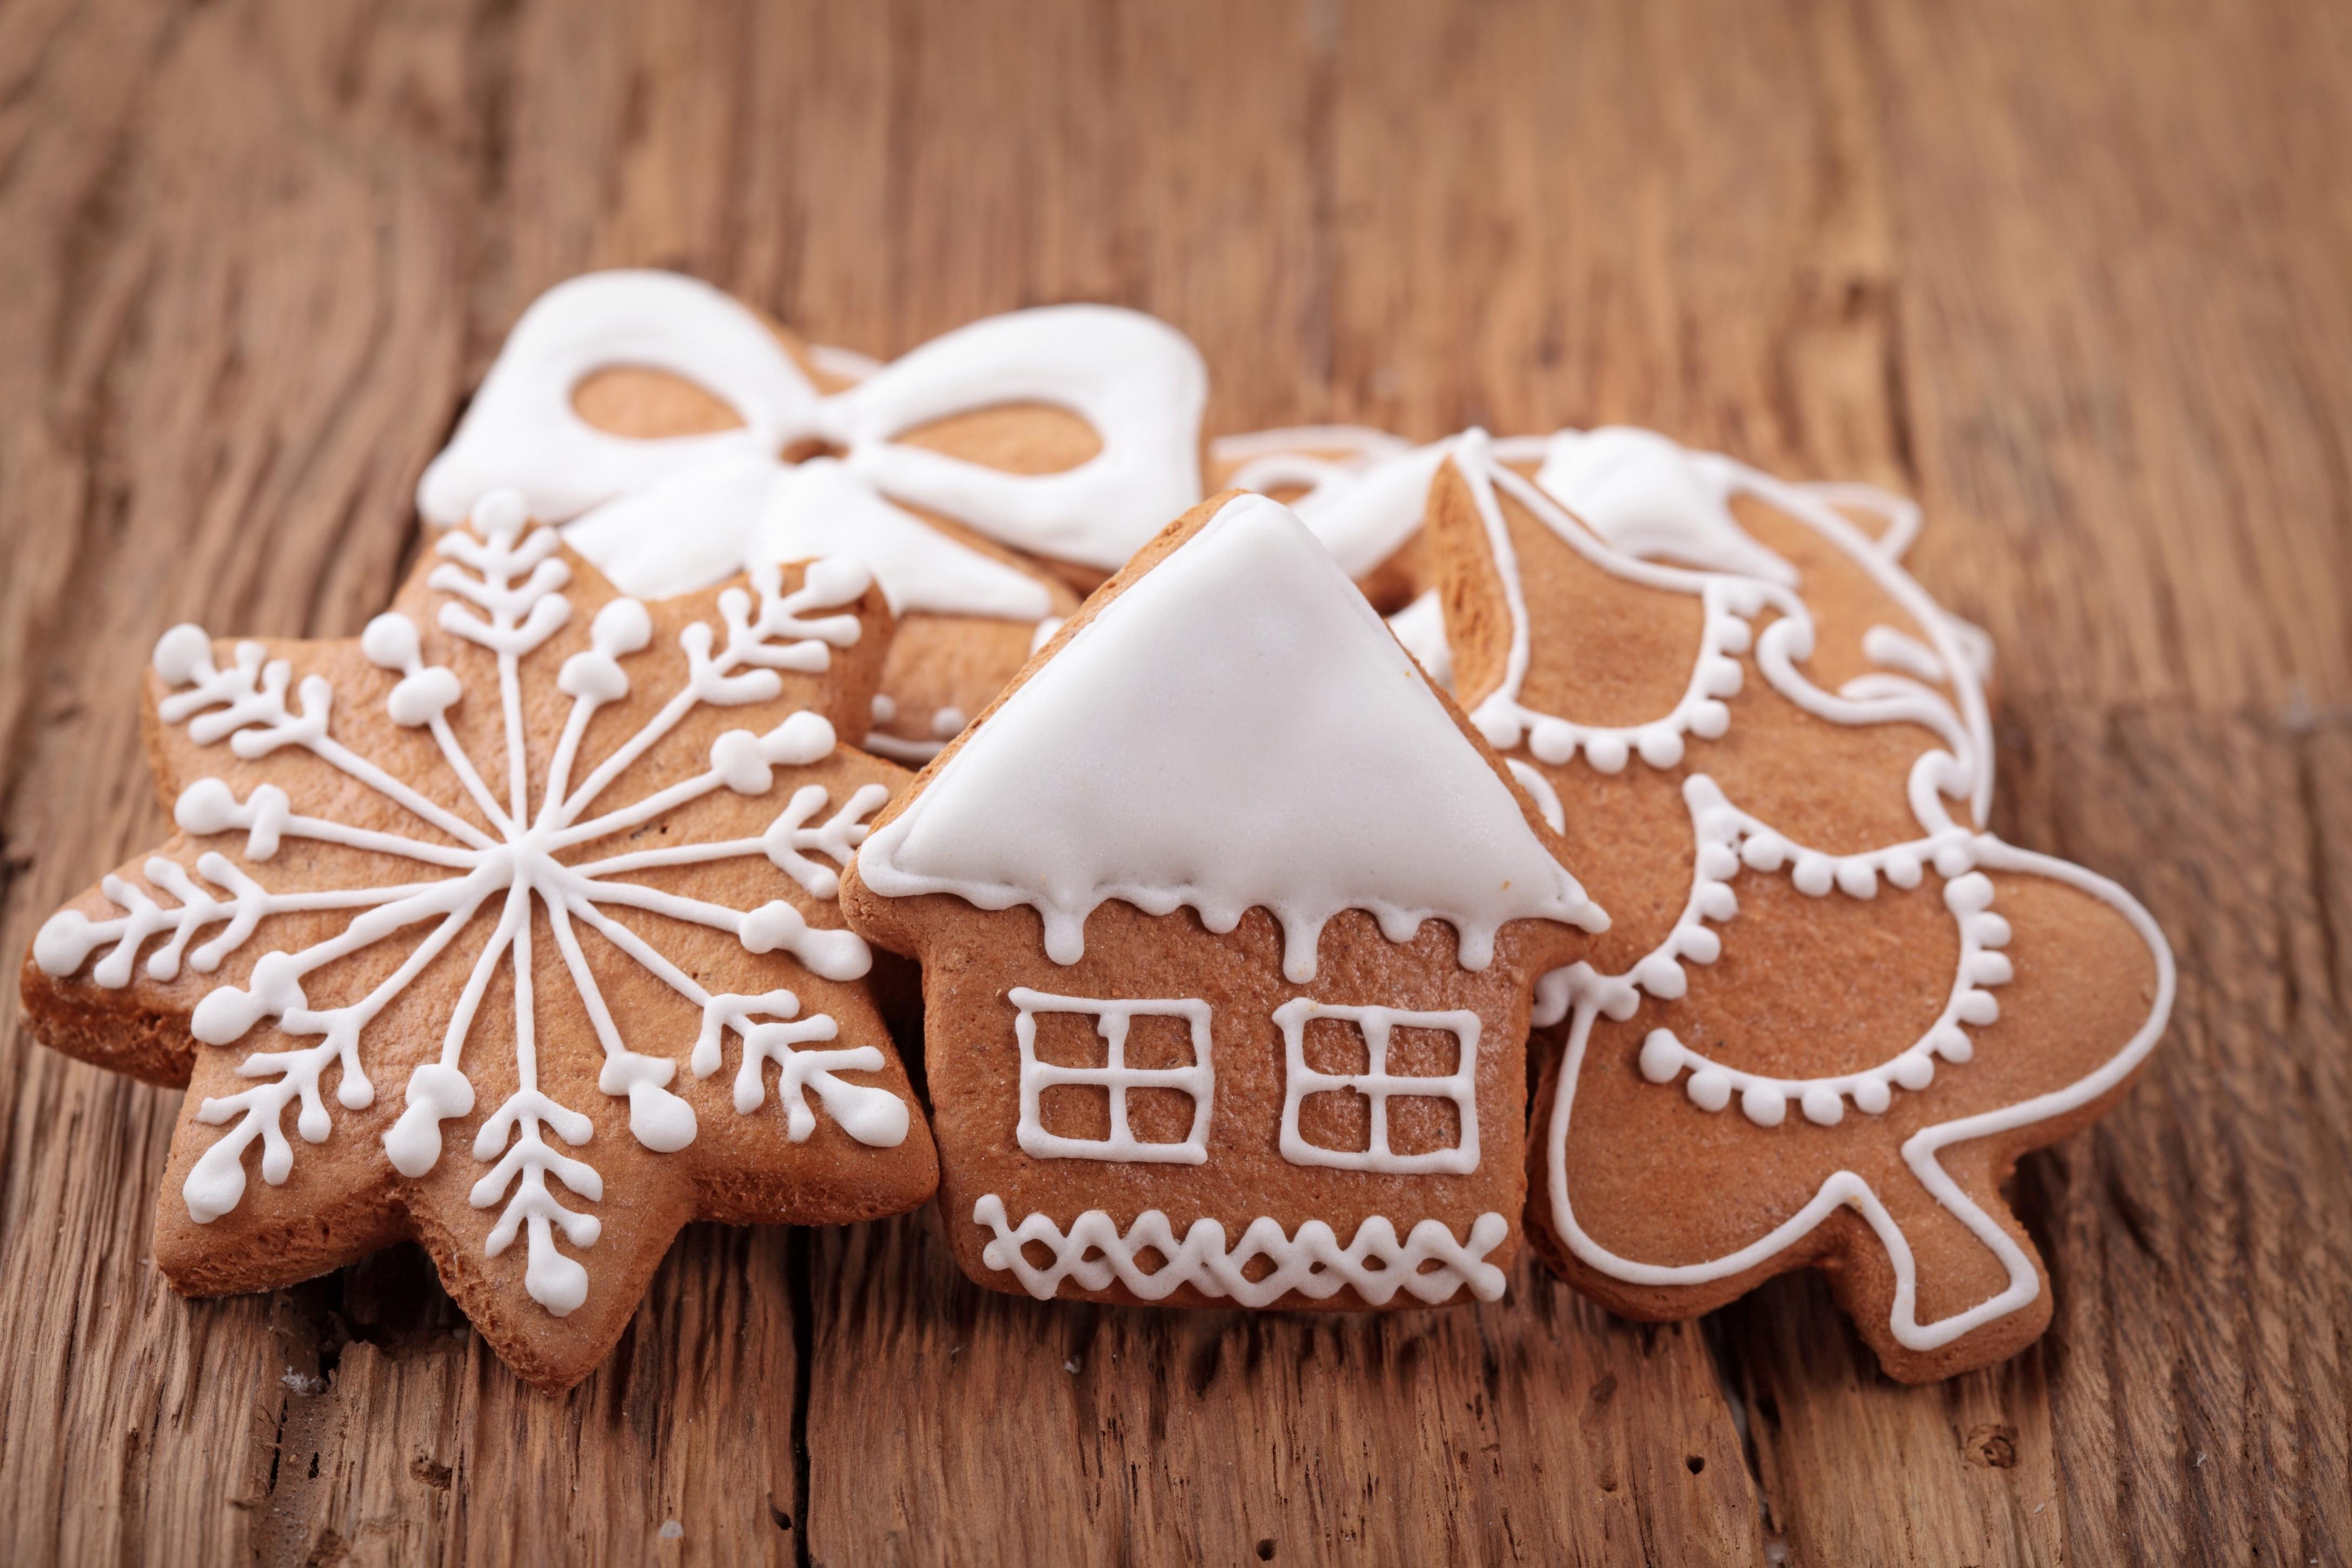 Christmas Cookies Image  North Pole Bureau Investigations Case 1225 Case of